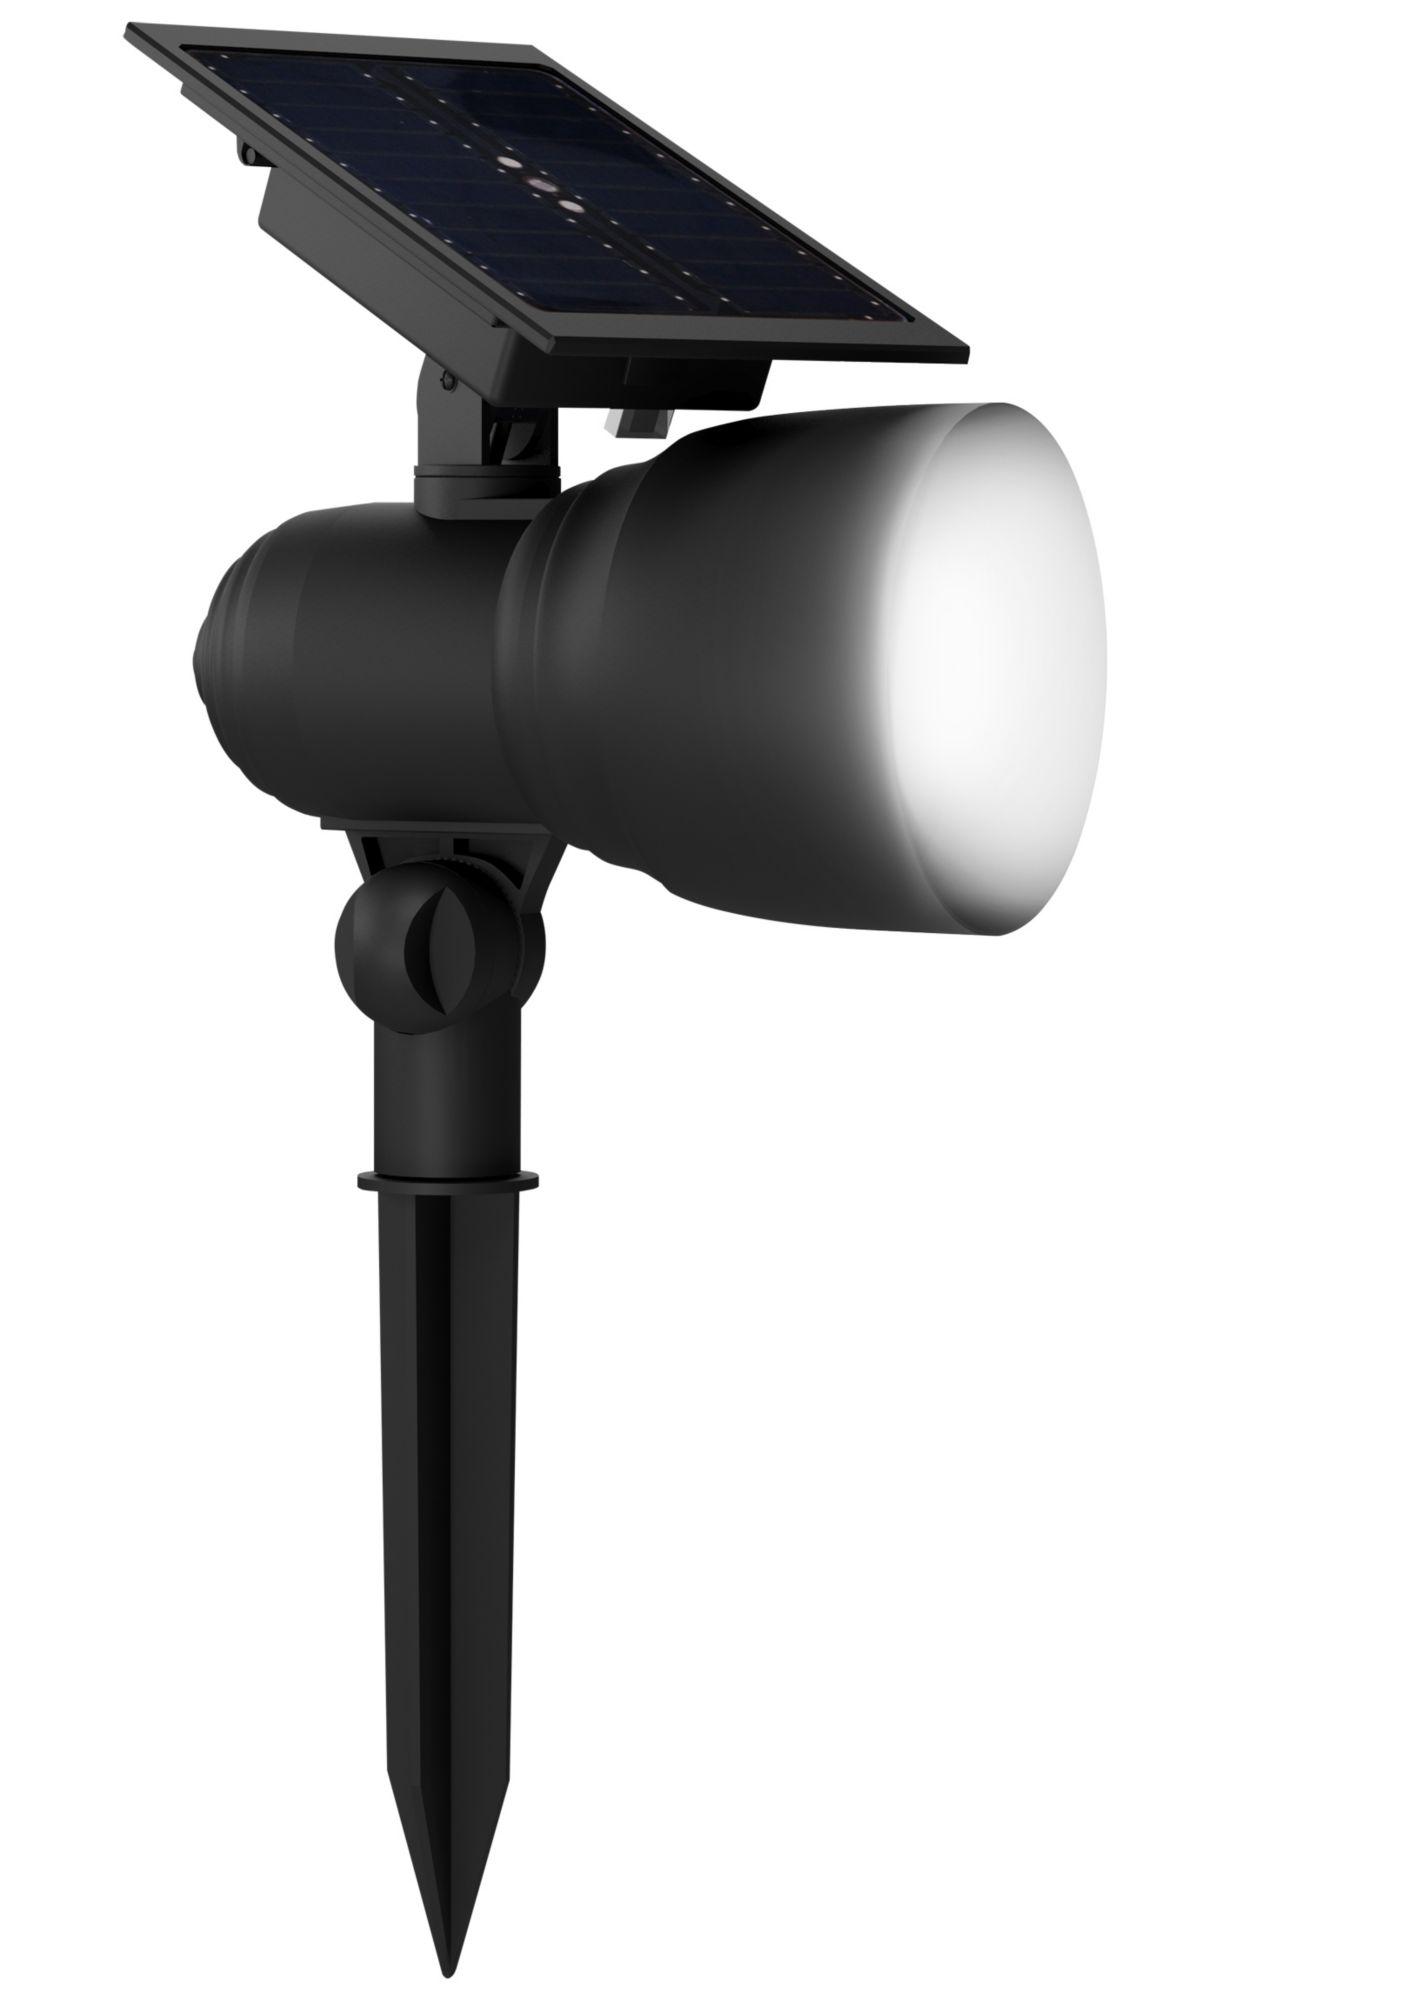 duracell led solar spot light gartenlampe gl005bdu 30. Black Bedroom Furniture Sets. Home Design Ideas